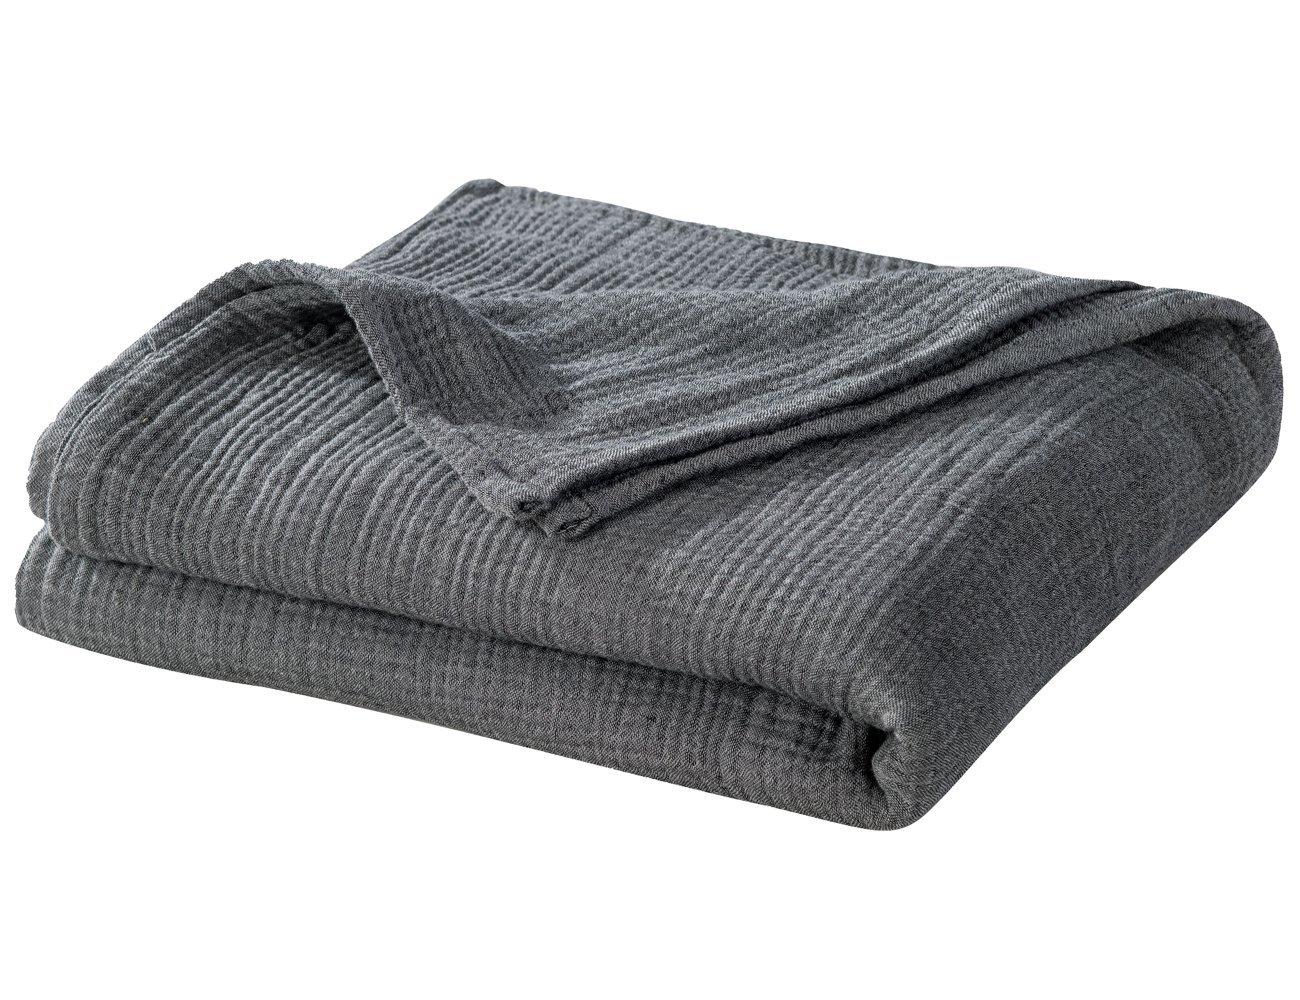 PHF Muslin Throw Blanket for Summer Super Soft 100% Cotton Grey